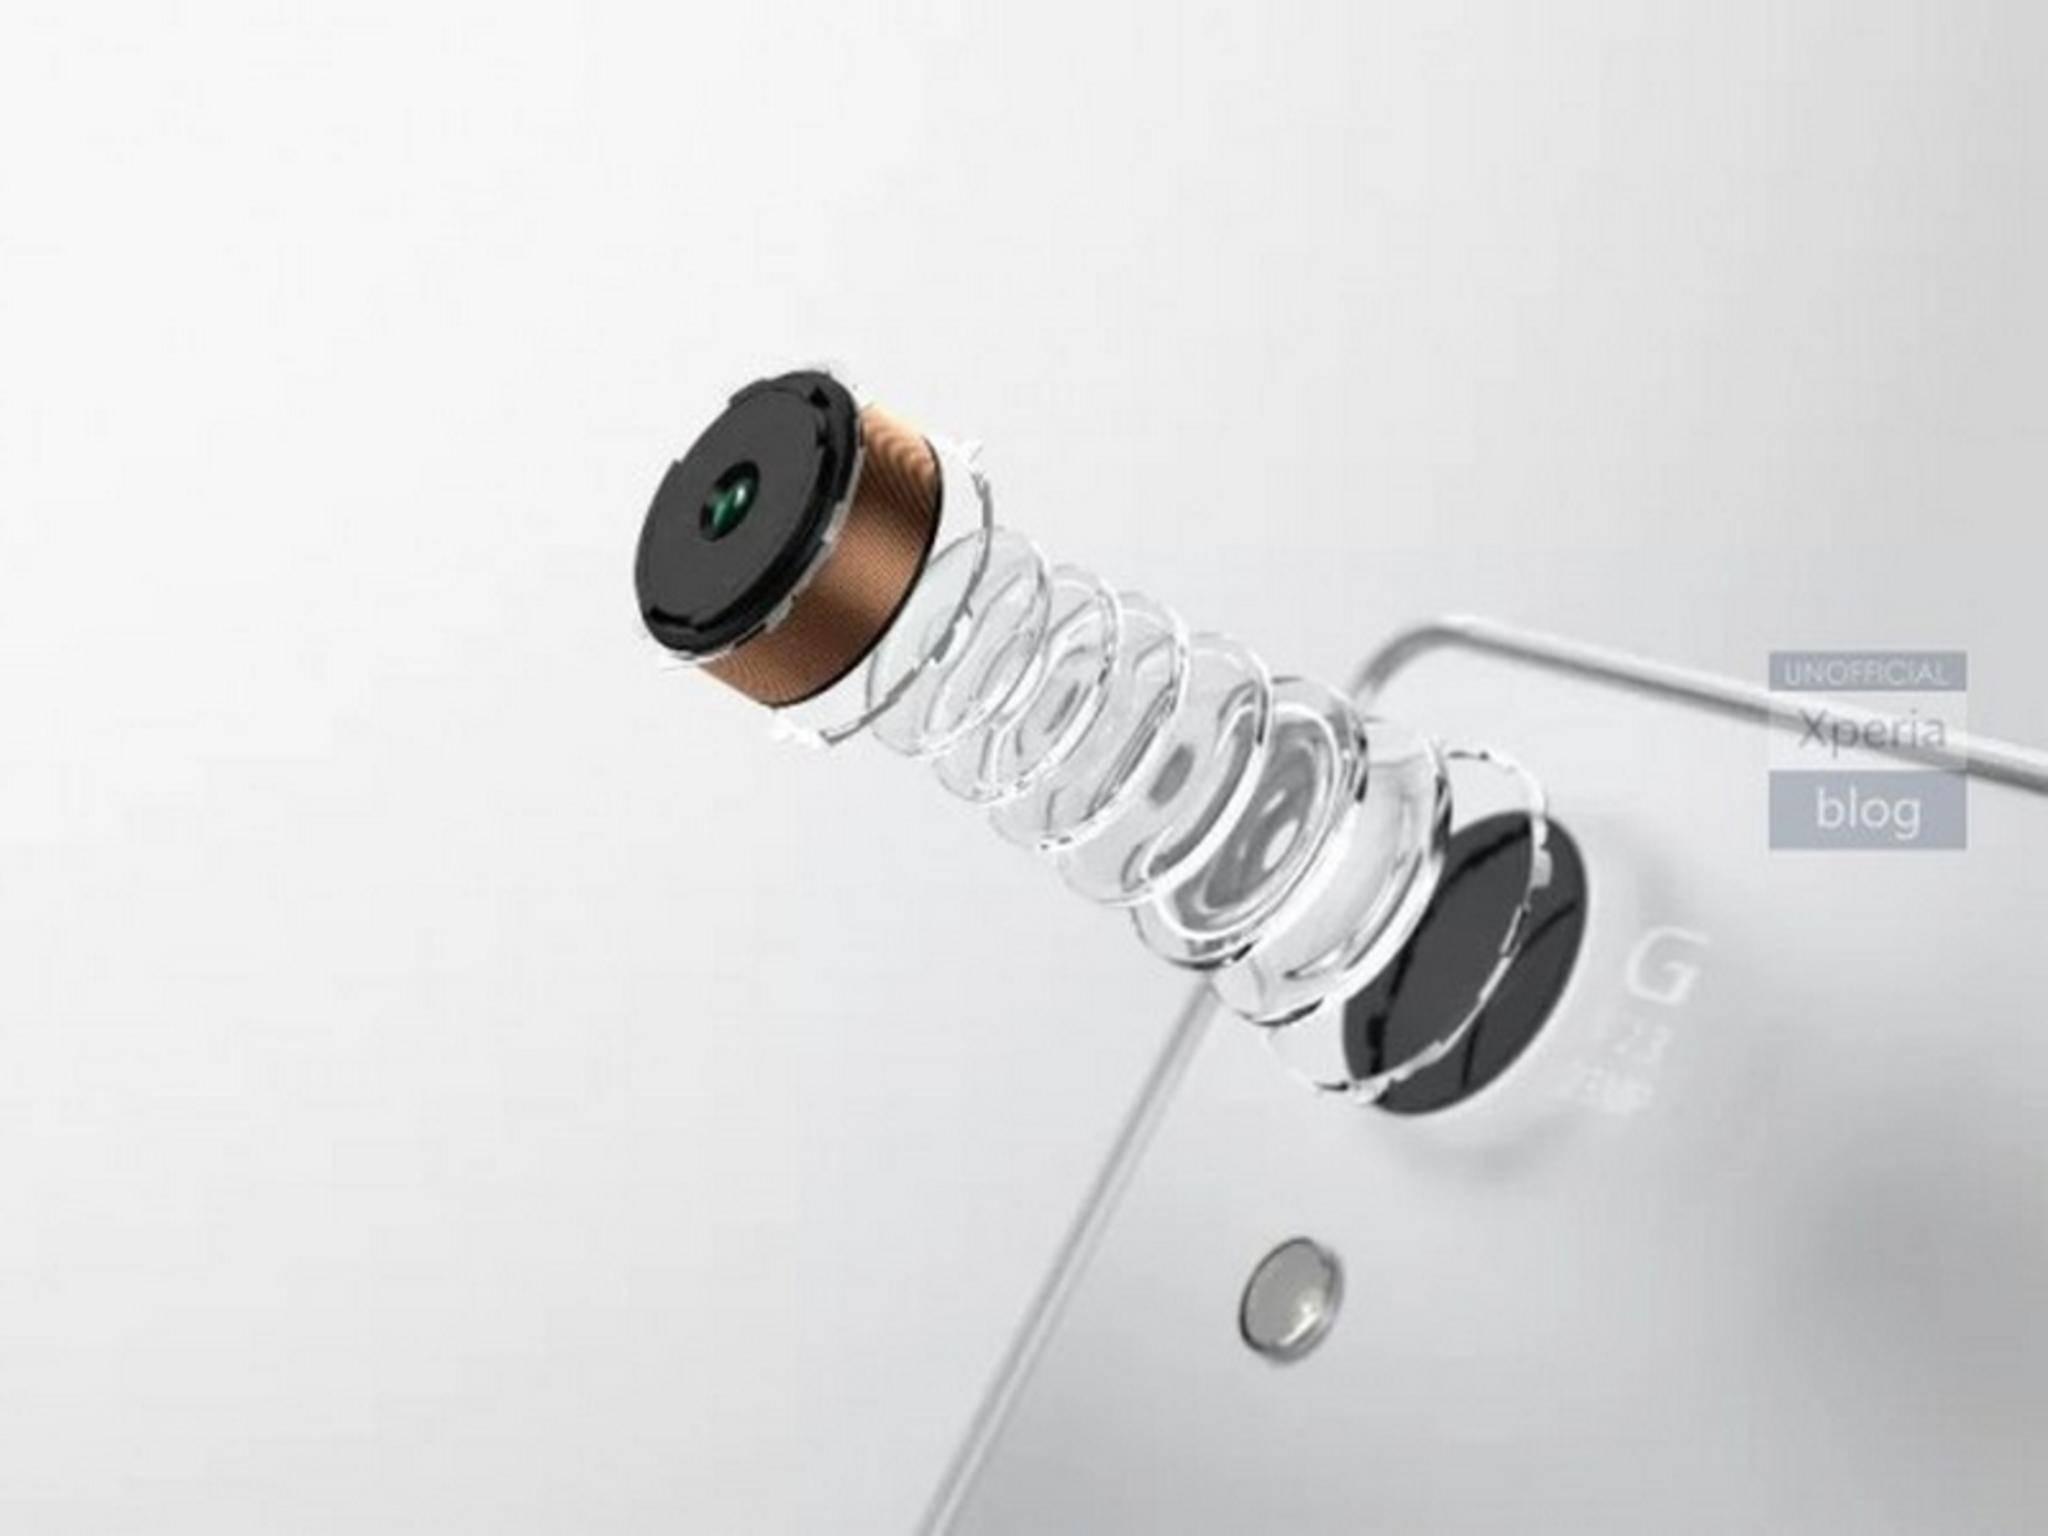 Das Xperia Z5 besitzt offenbar eine 23-Megapixel-Kamera.